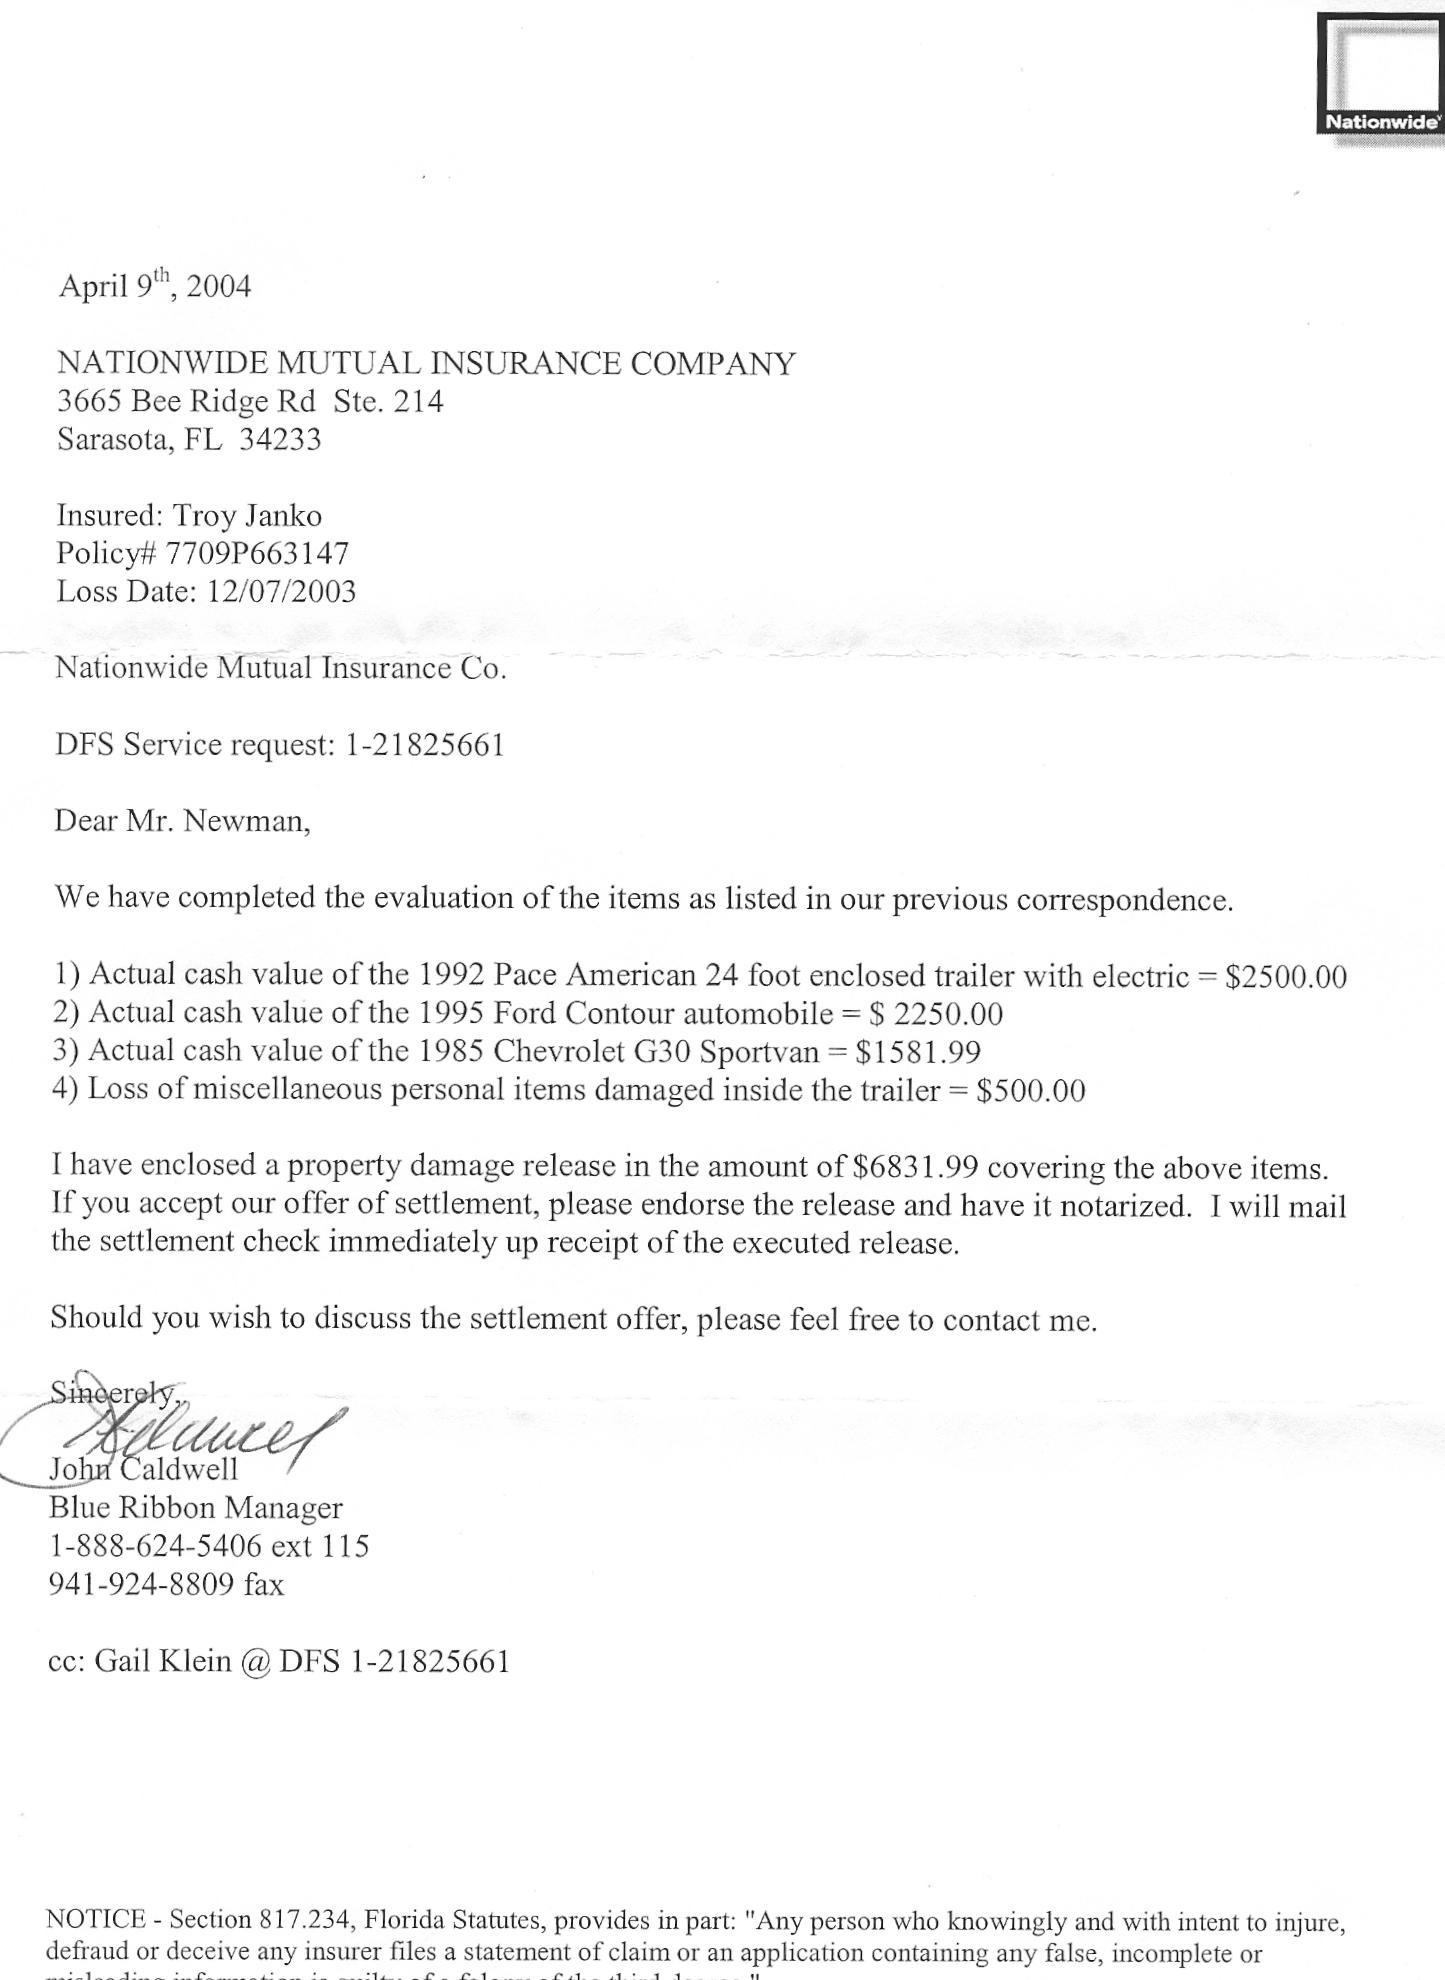 car accident demand letter word online template cv resume car accident demand letter sample demand letter car accident less serious injury car accident demand car